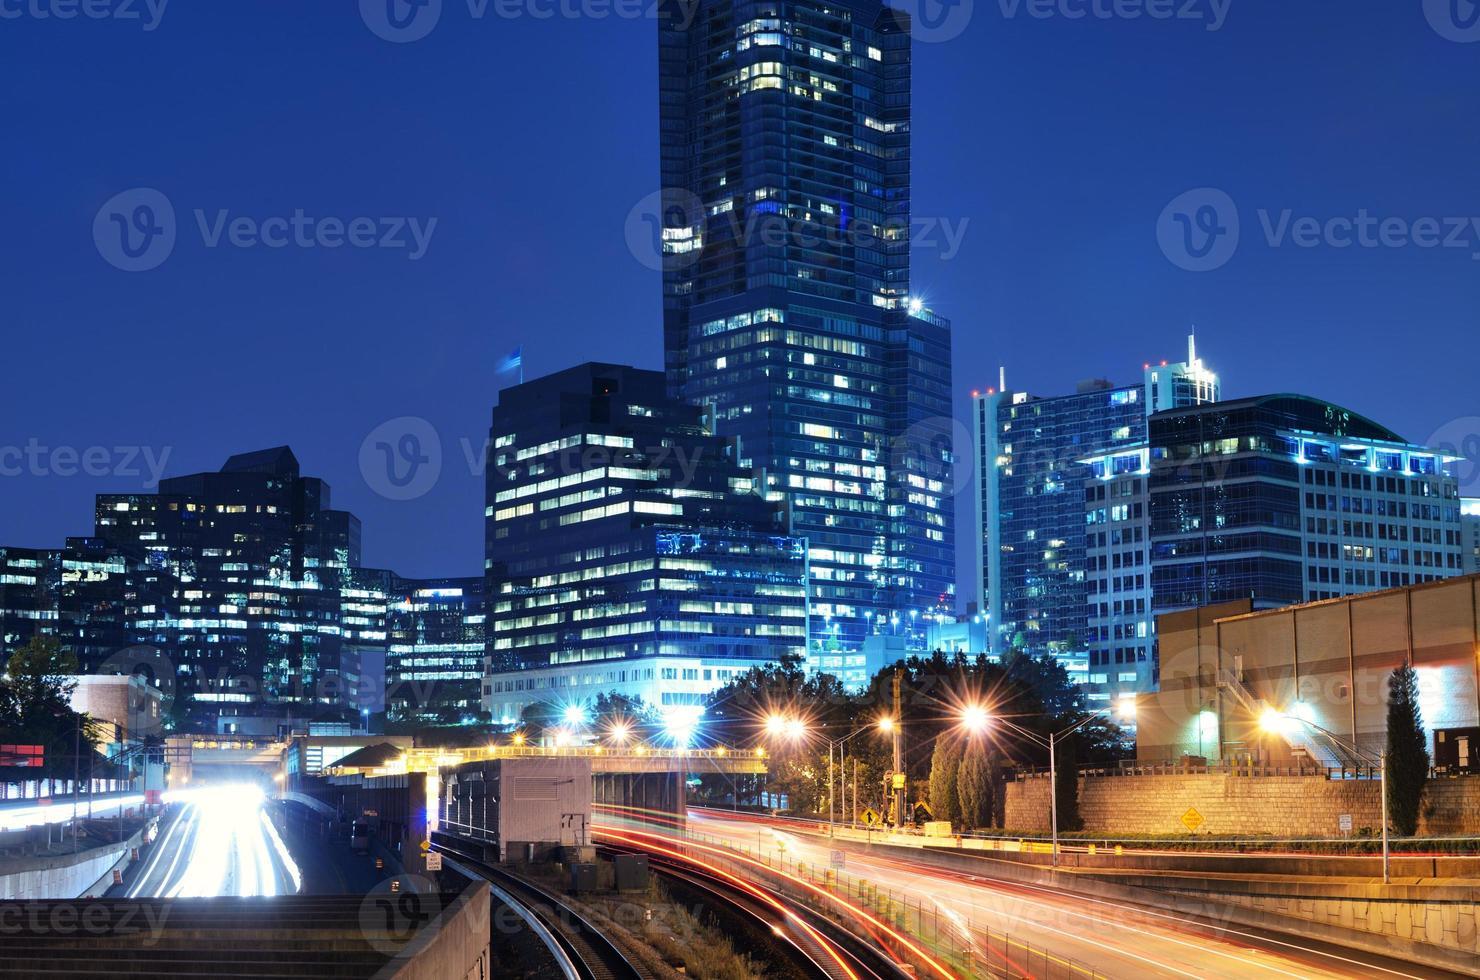 autostrada illuminata in buckhead foto